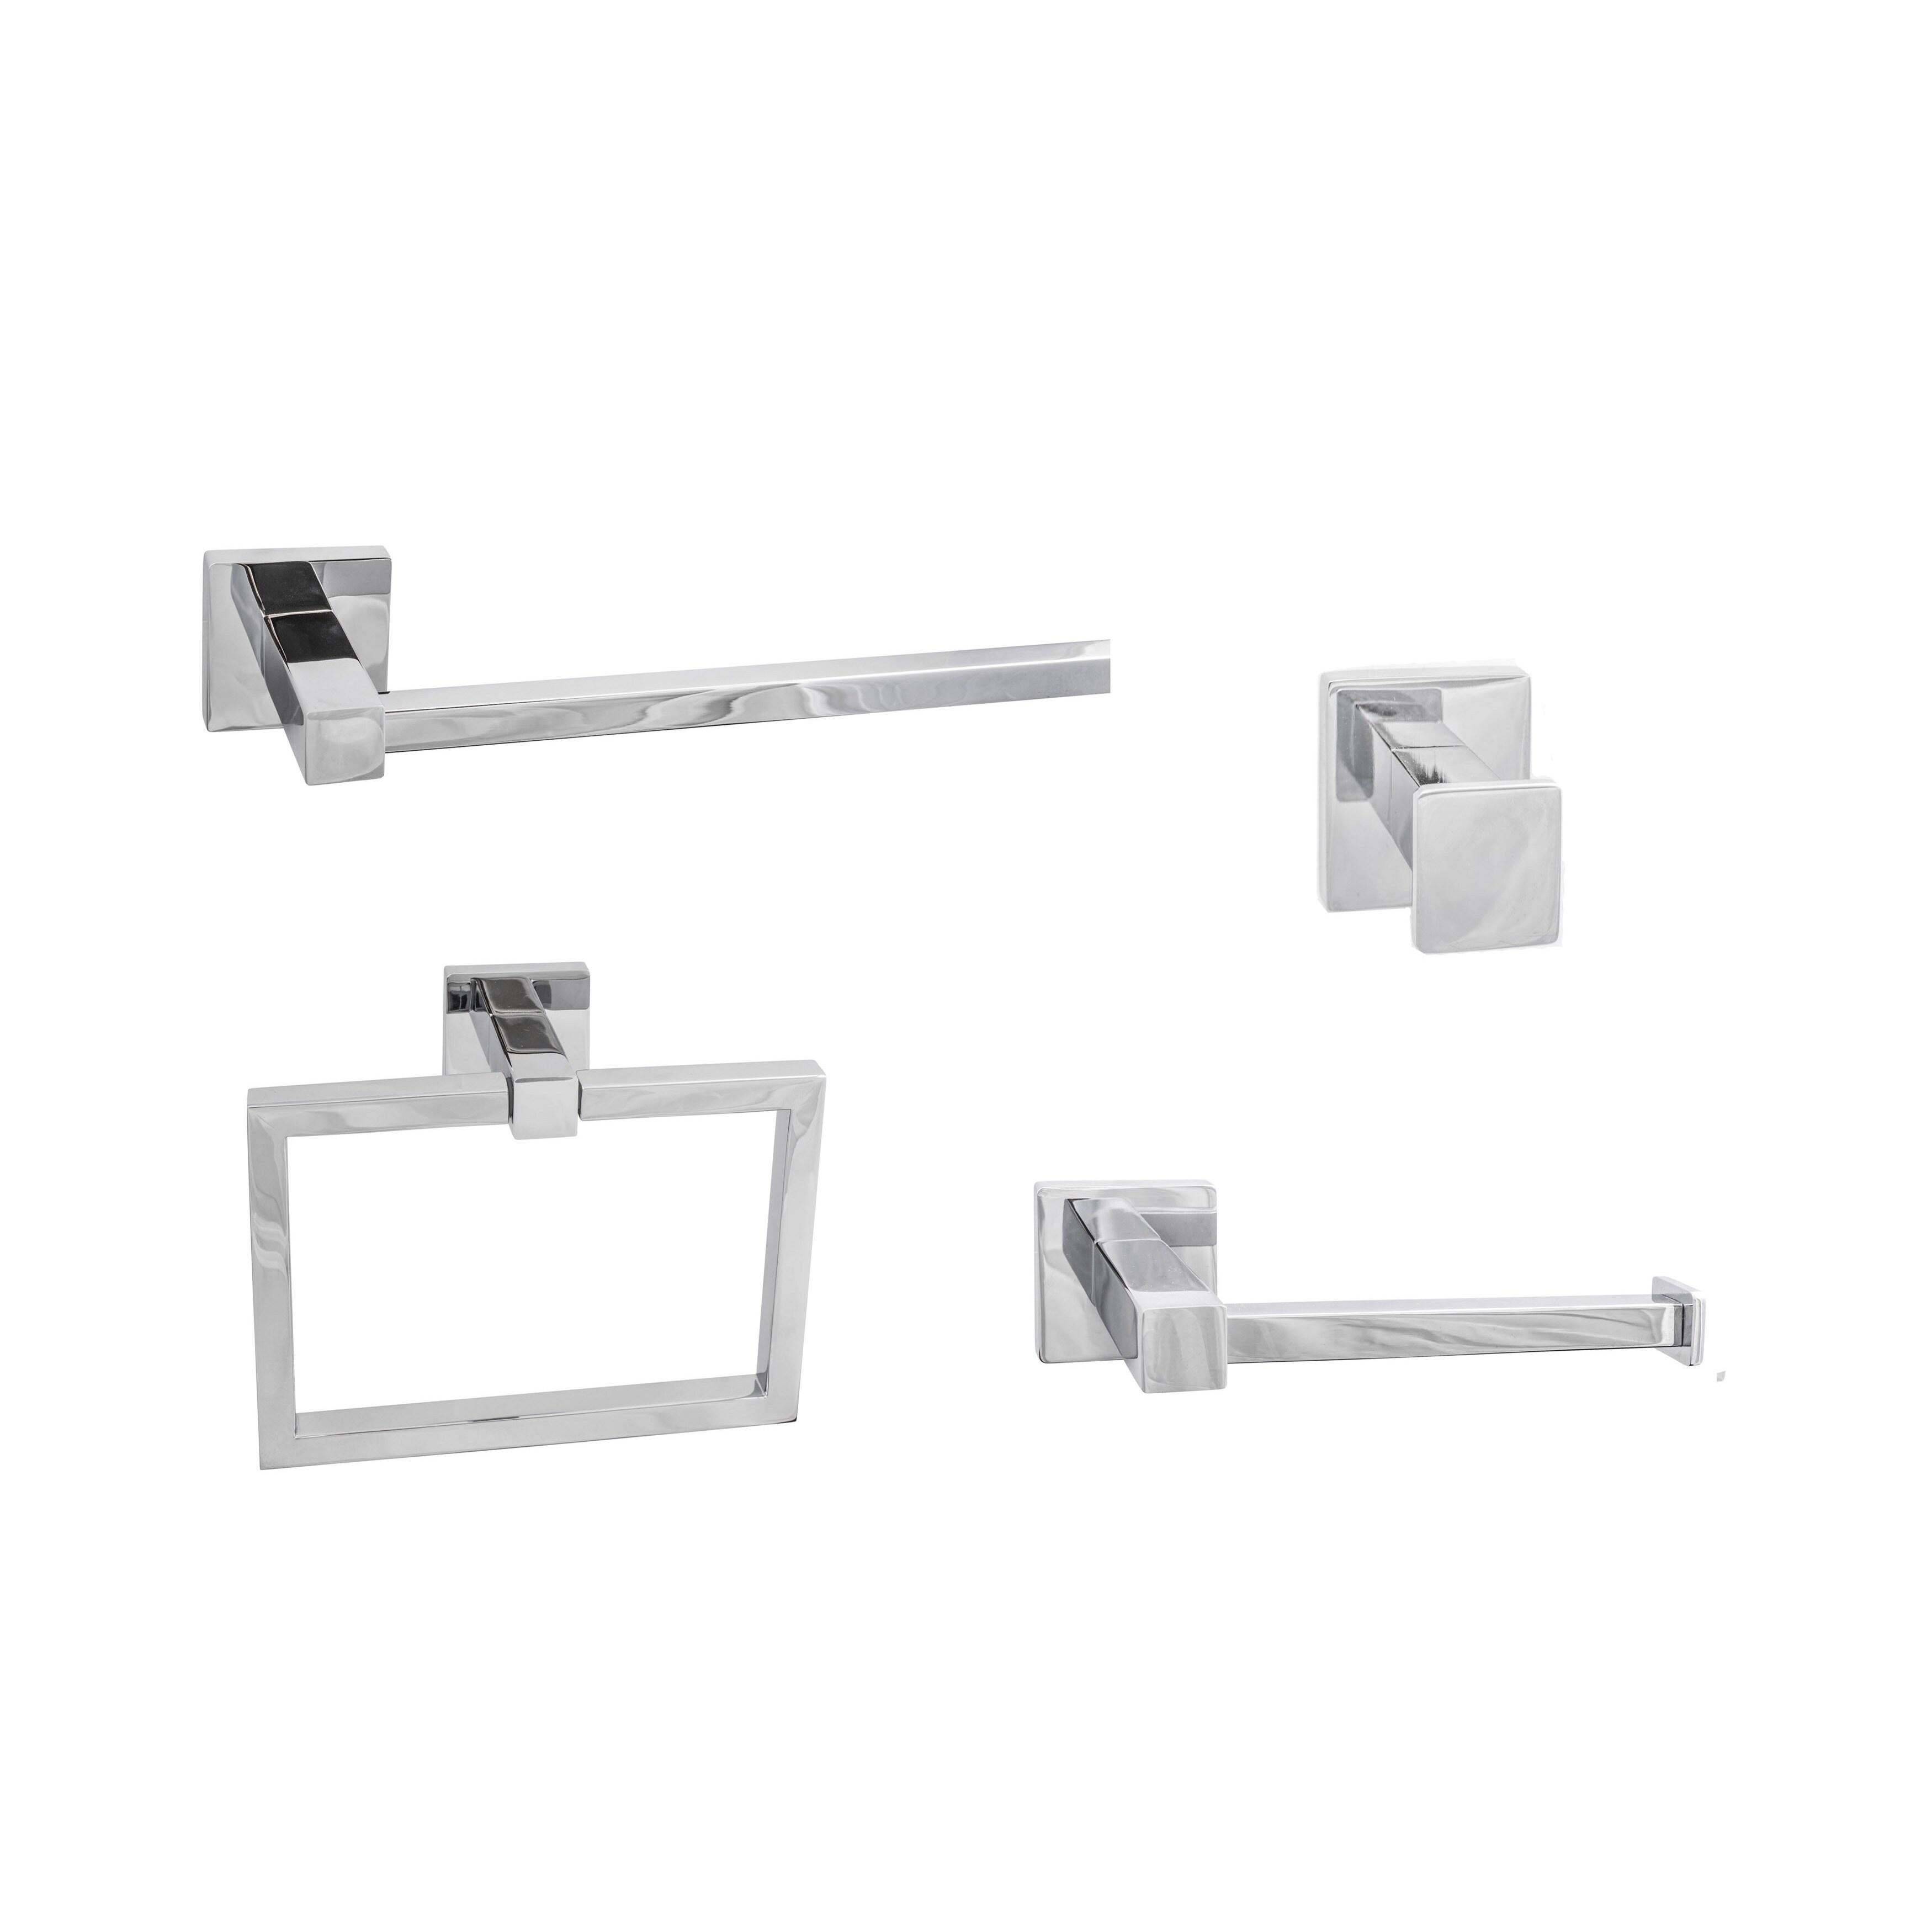 4 Piece Bathroom Accessory Set